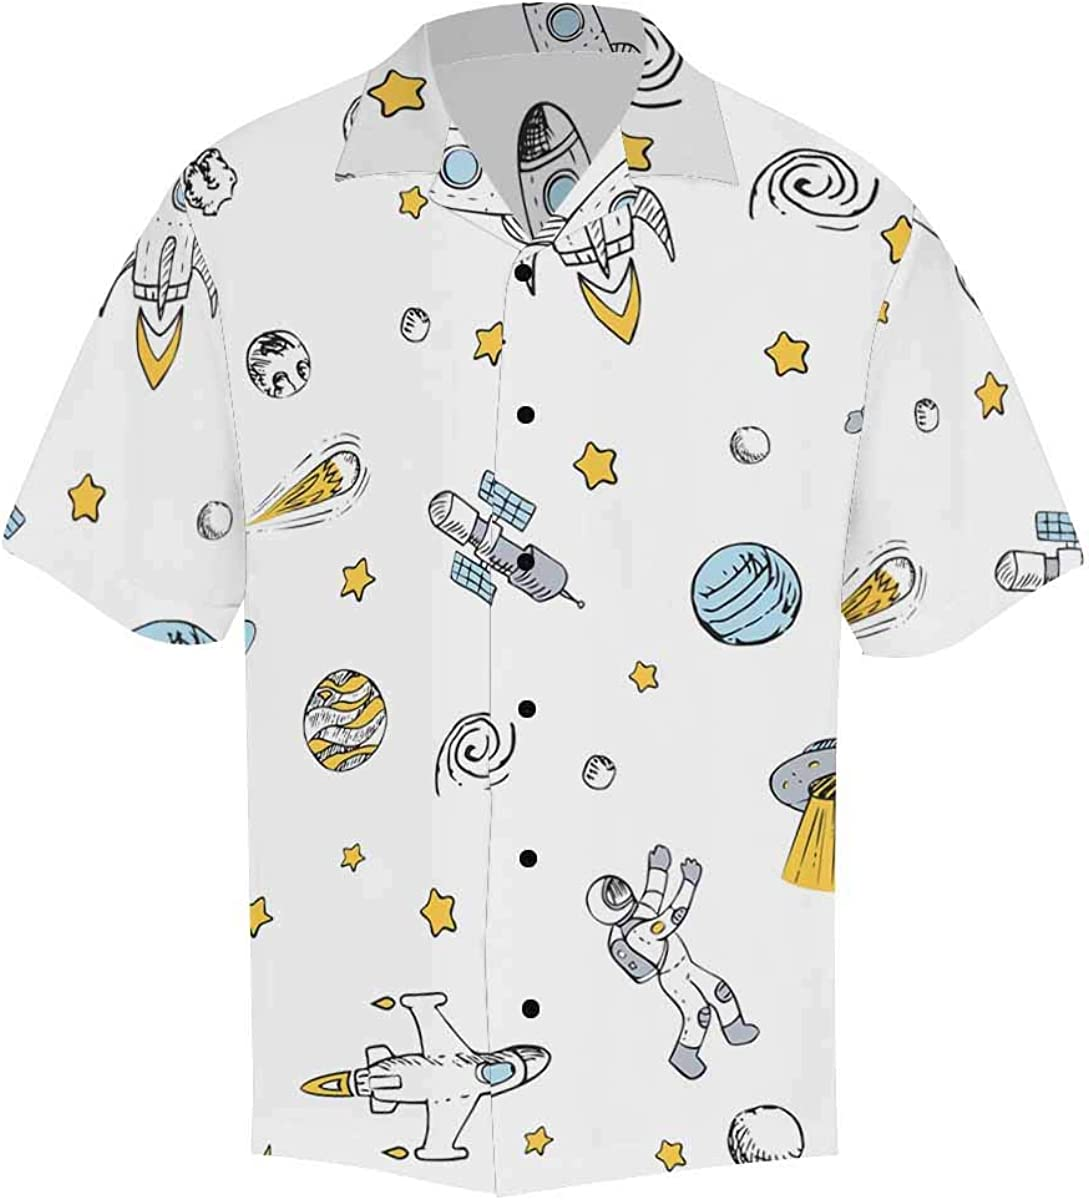 InterestPrint Men's Casual Button Down Short Sleeve Colorful Letter Hawaiian Shirt (S-5XL)